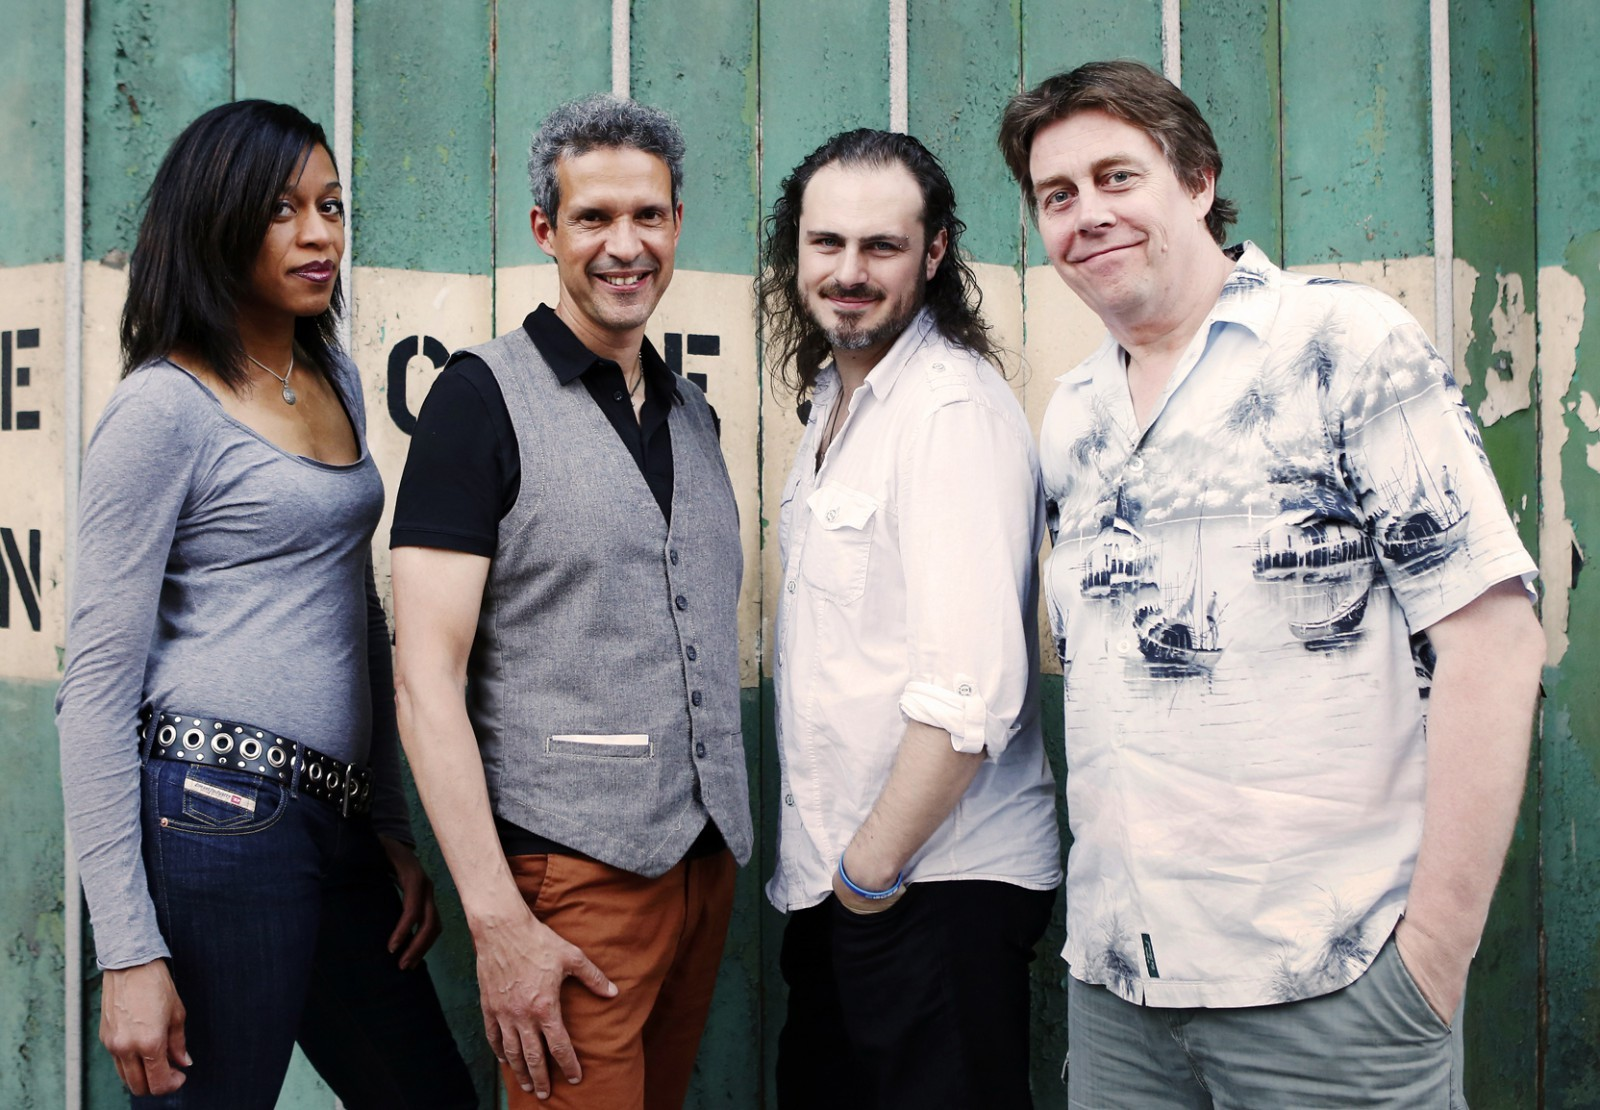 Mike Lindup Band